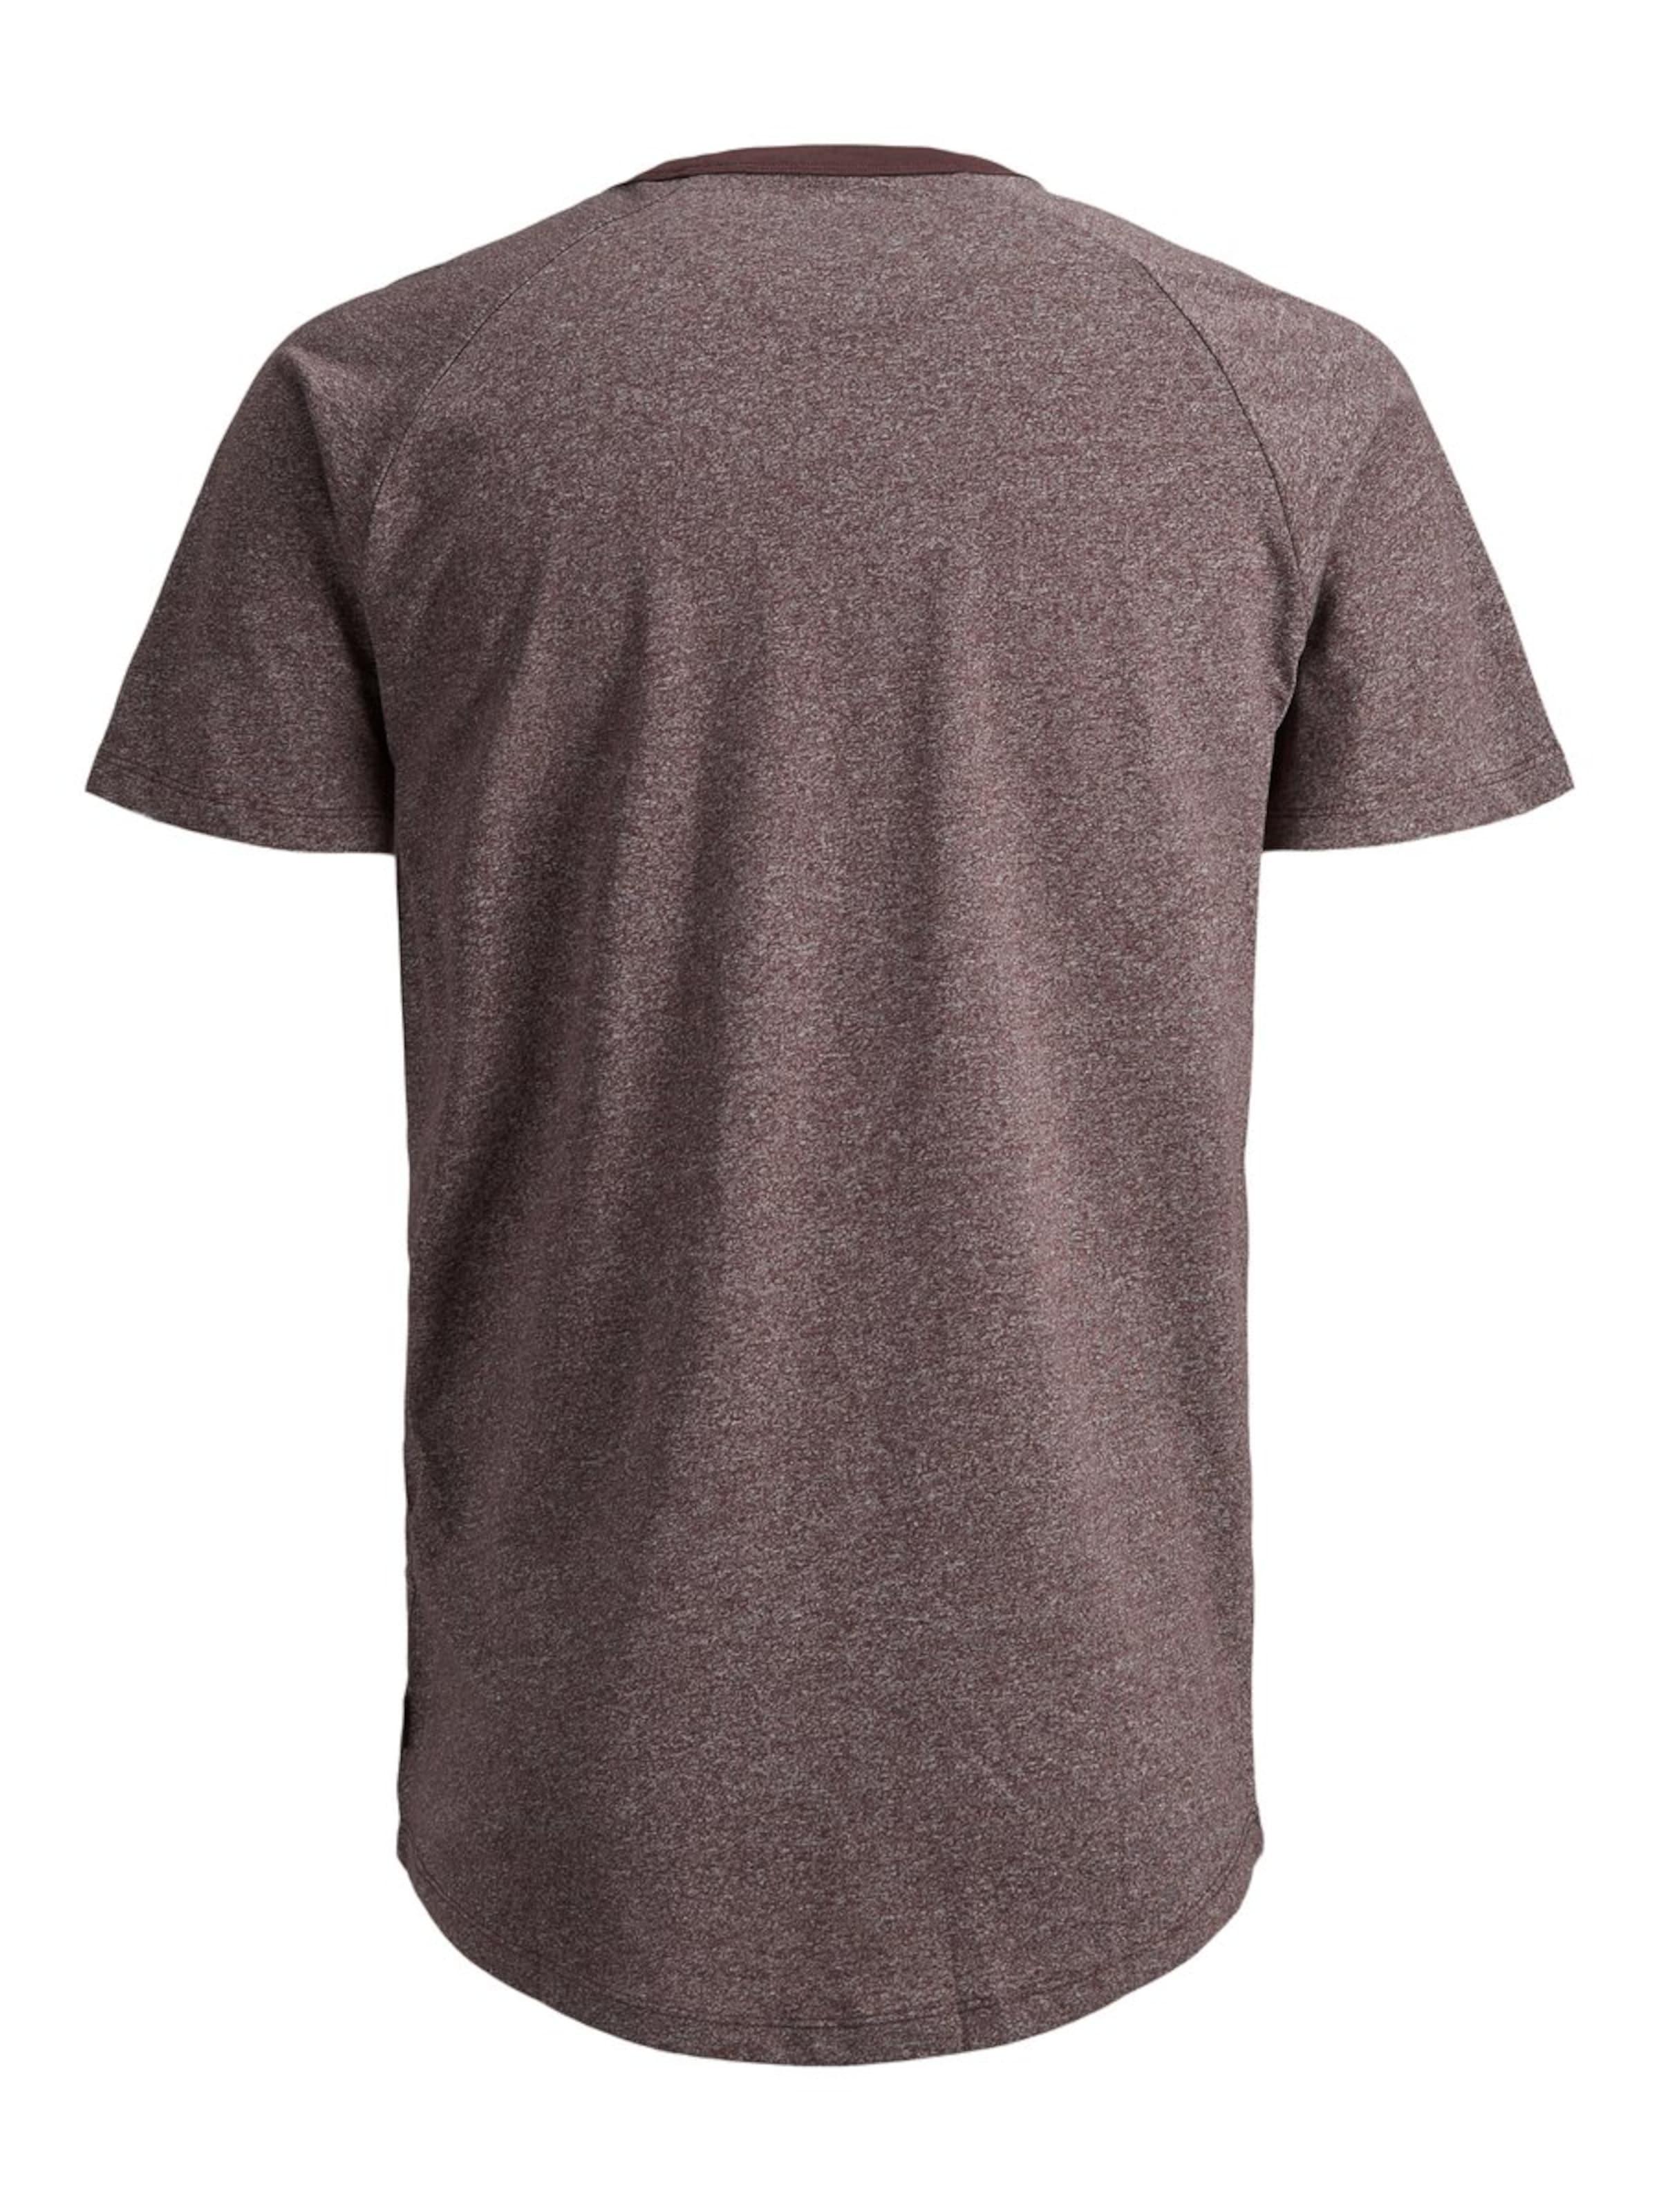 Jackamp; Rouge Jones En T shirt Foncé b7YyfI6gv